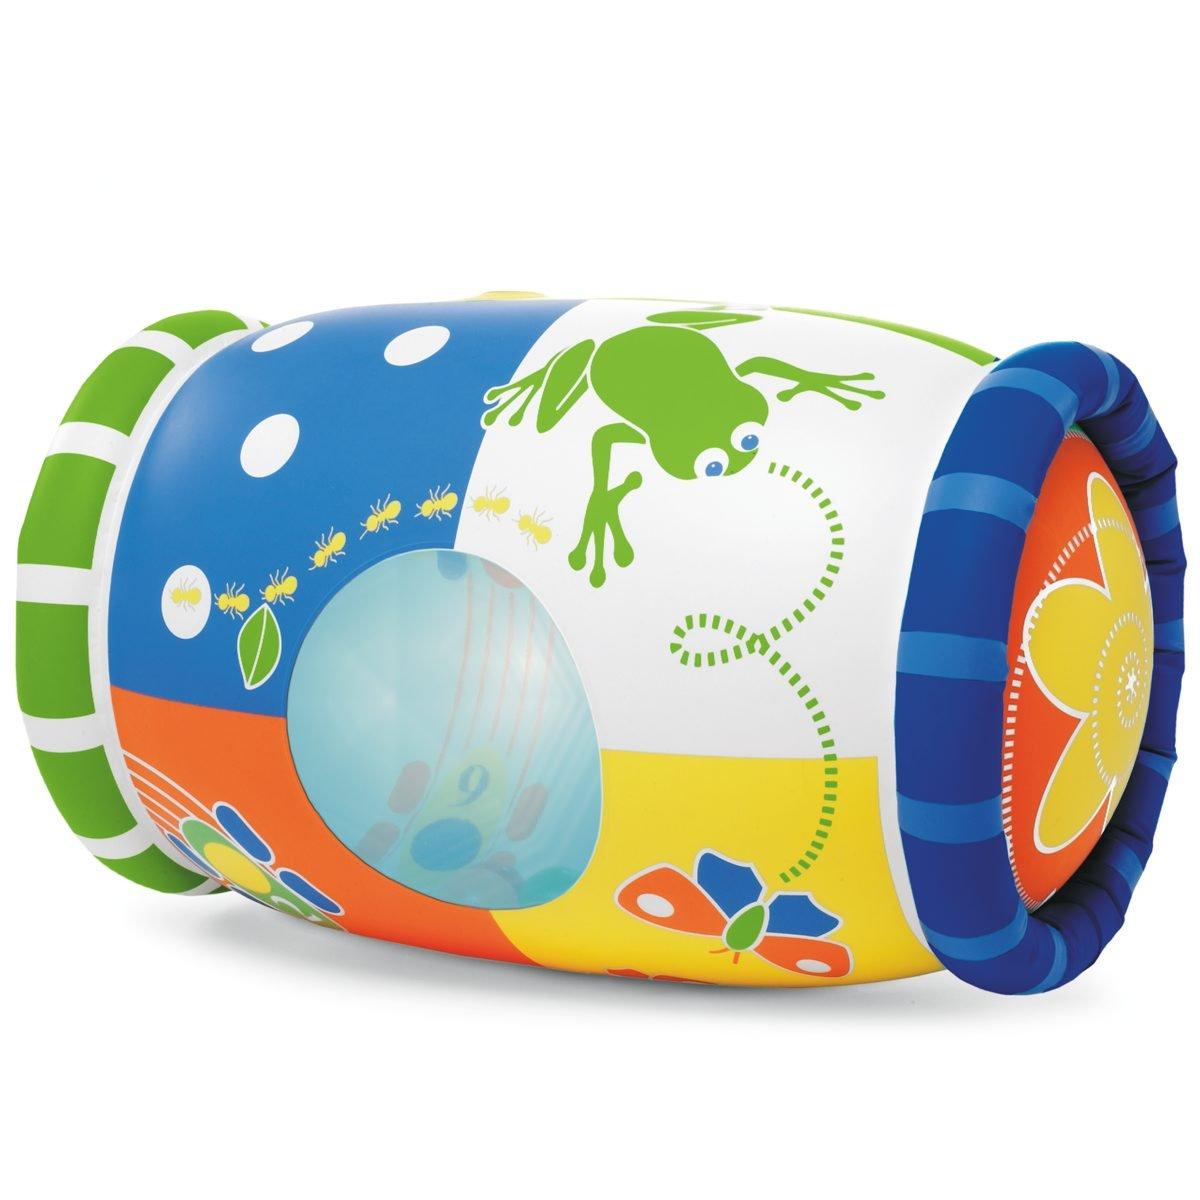 Chicco 27 cm Musical Roller Nursery Toy   B000816J2E